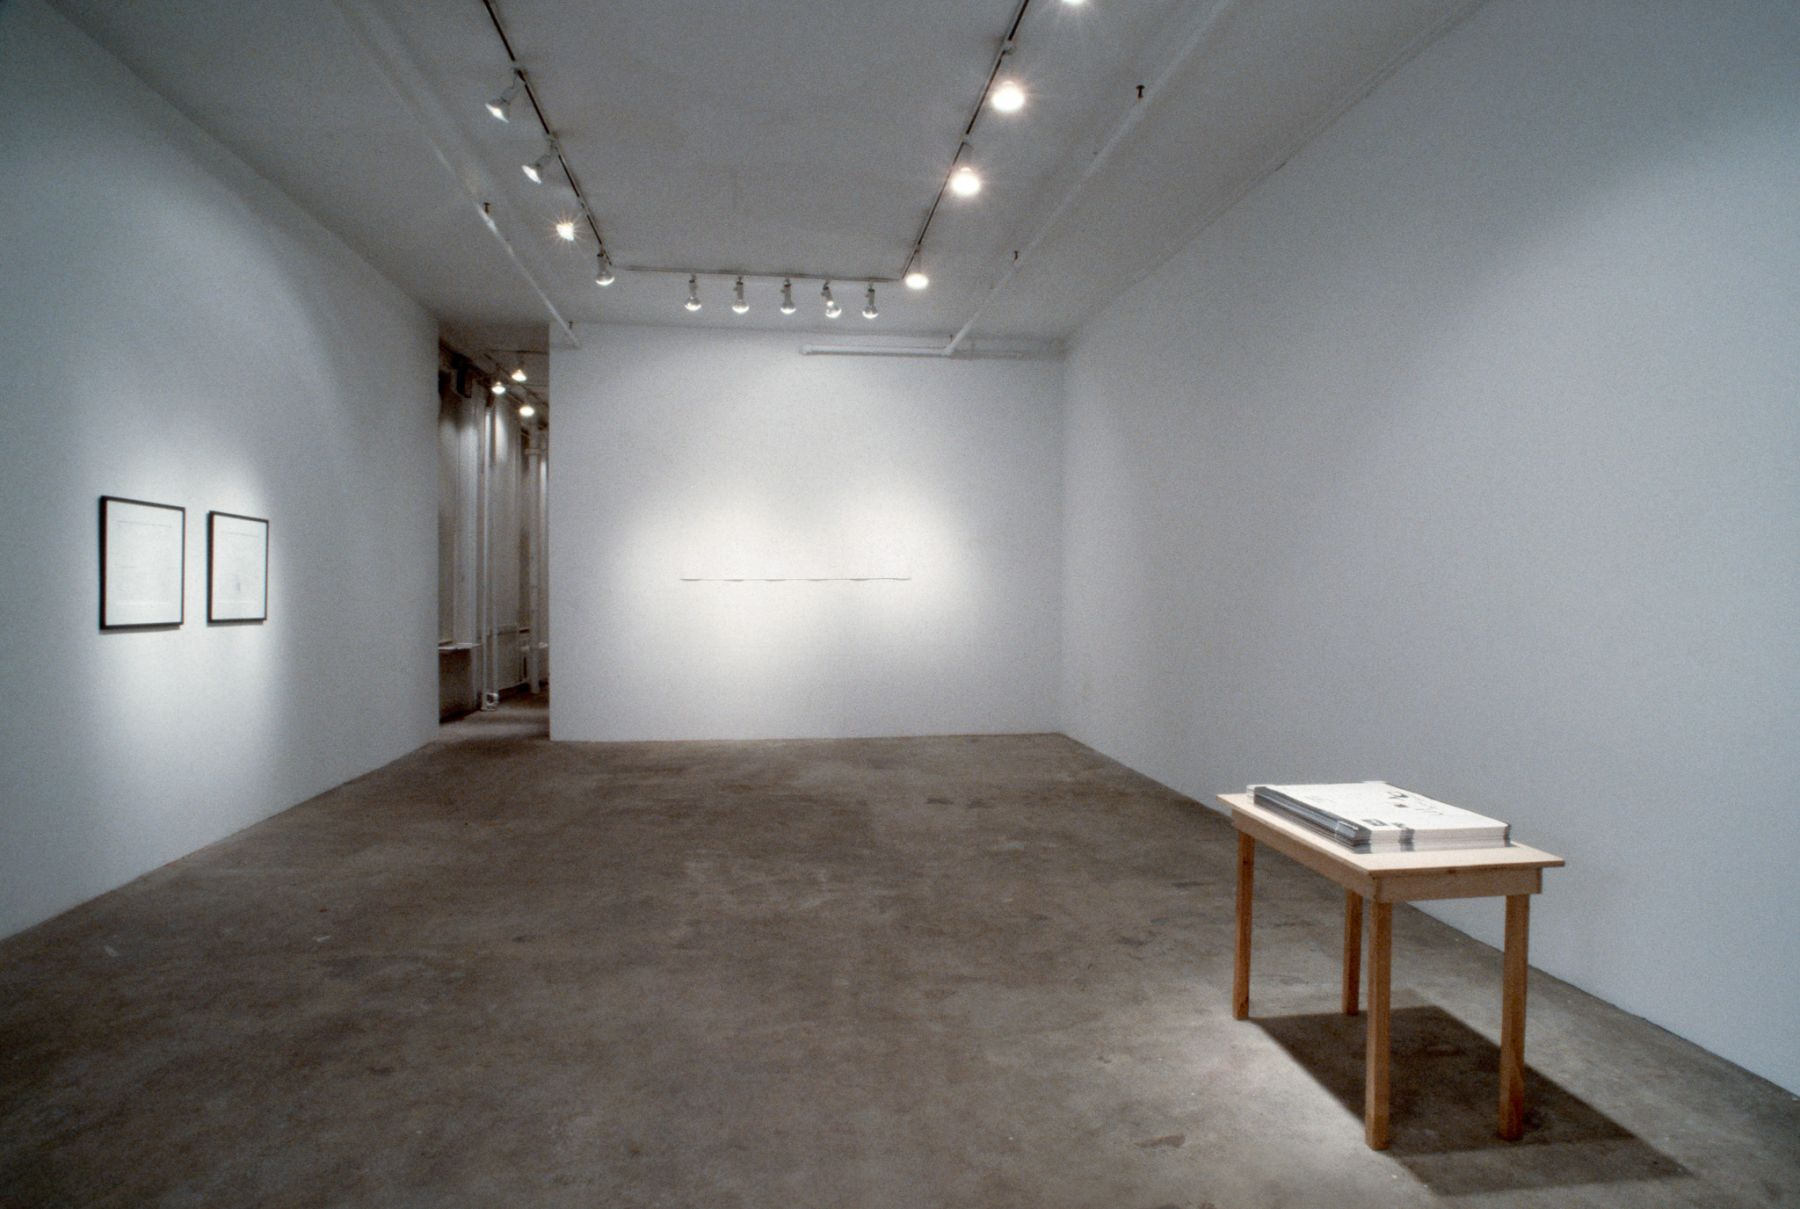 Hans-Peter Feldmann, Rodney Graham, Allen Ruppersberg, 303 Gallery, 1993